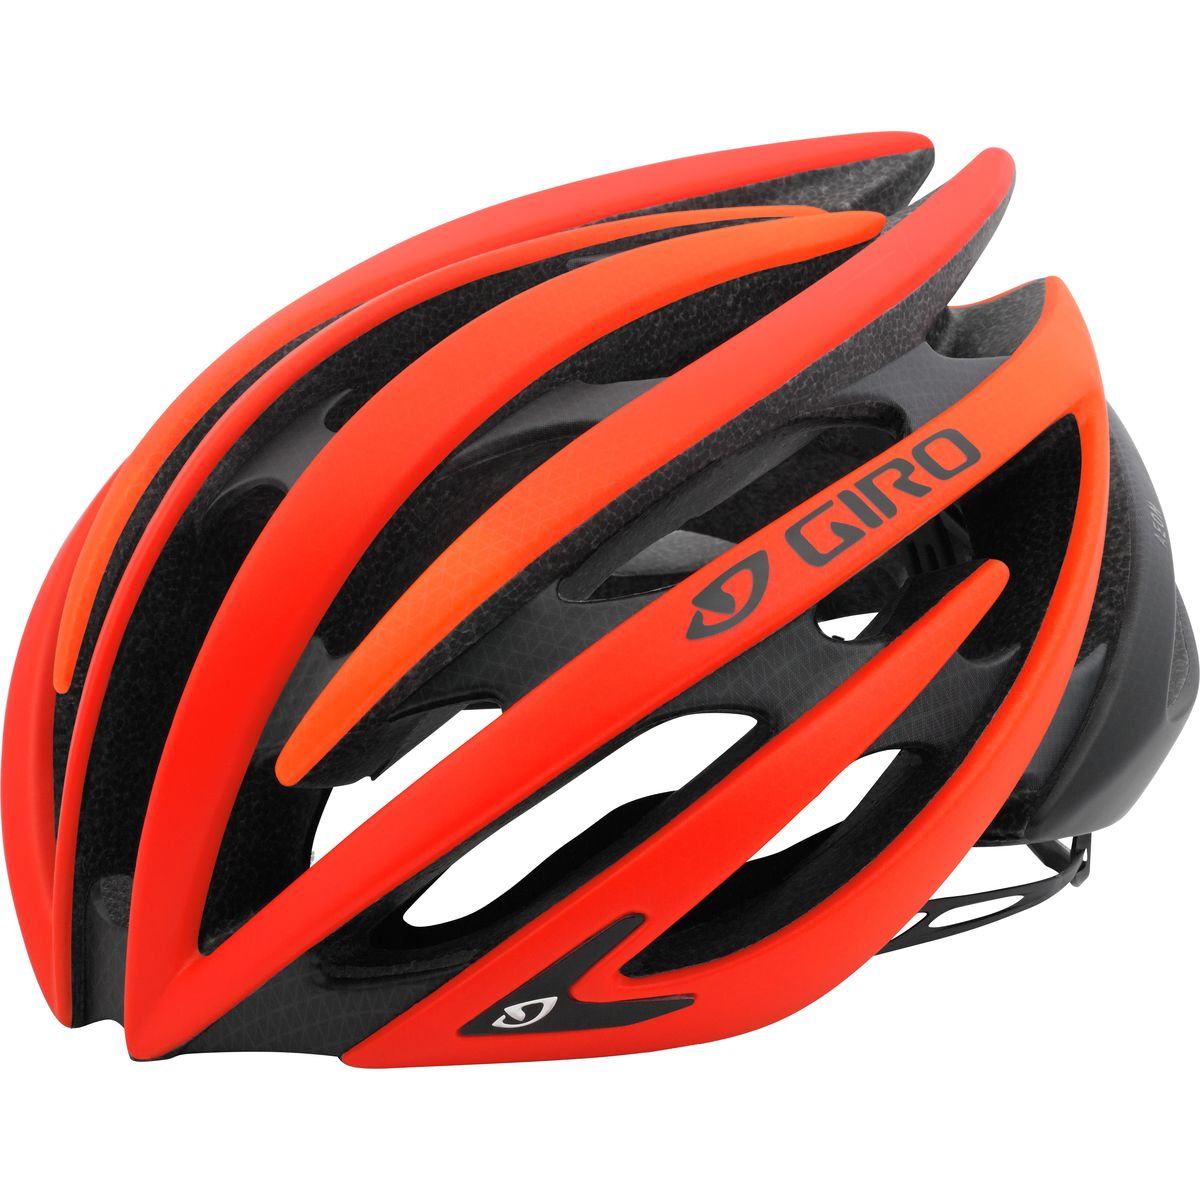 Giro Aeon Helmet Road Helmets Competitive Cyclist